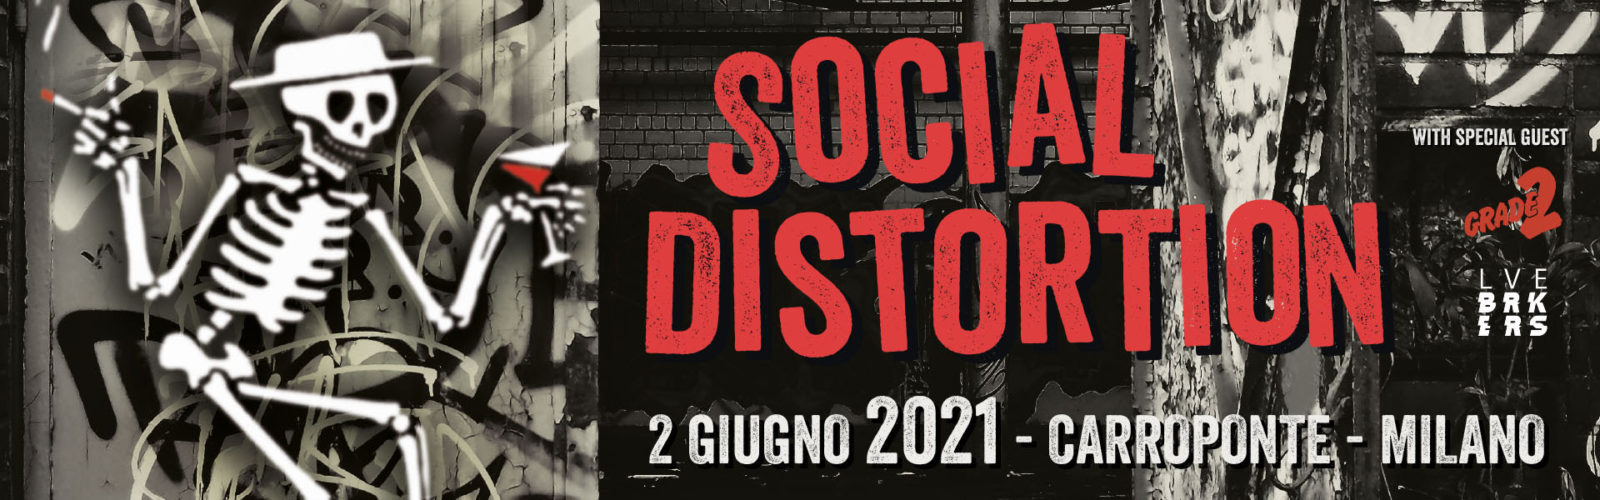 social distortion 2021 milano